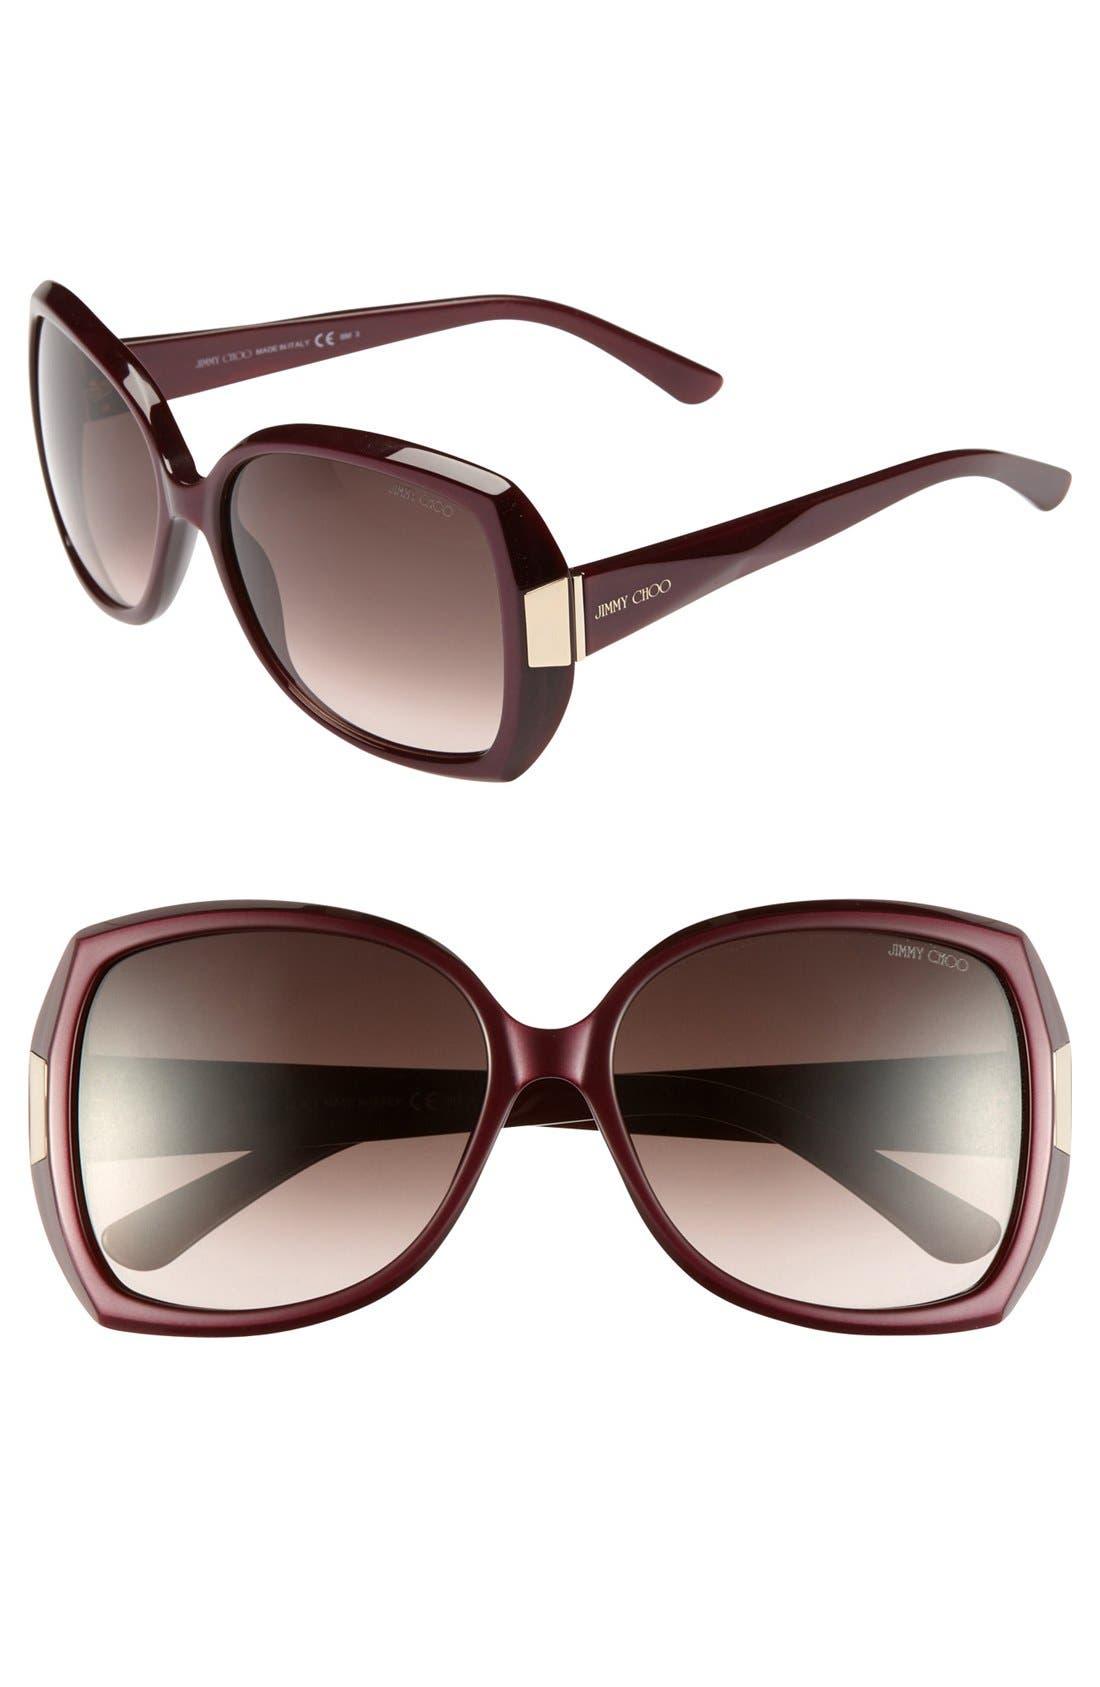 Main Image - Jimmy Choo 'Gaby' Oversized Sunglasses